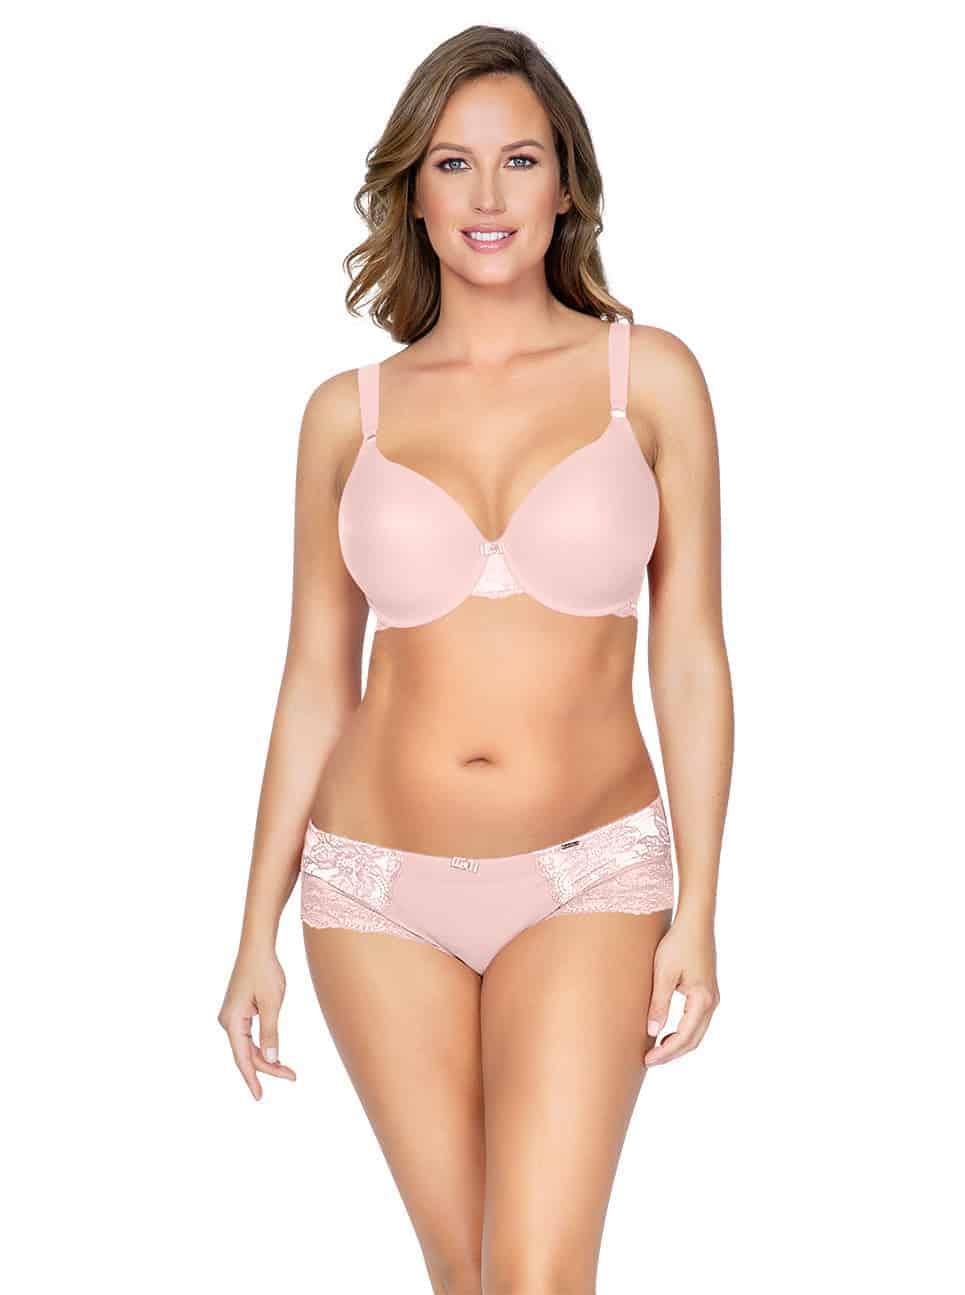 Marion ContourPaddedBraP5391 HipsterP5395 PinkParfait Front copy 2 - Marion Contour Padded Bra - Pink Parfait – P5391